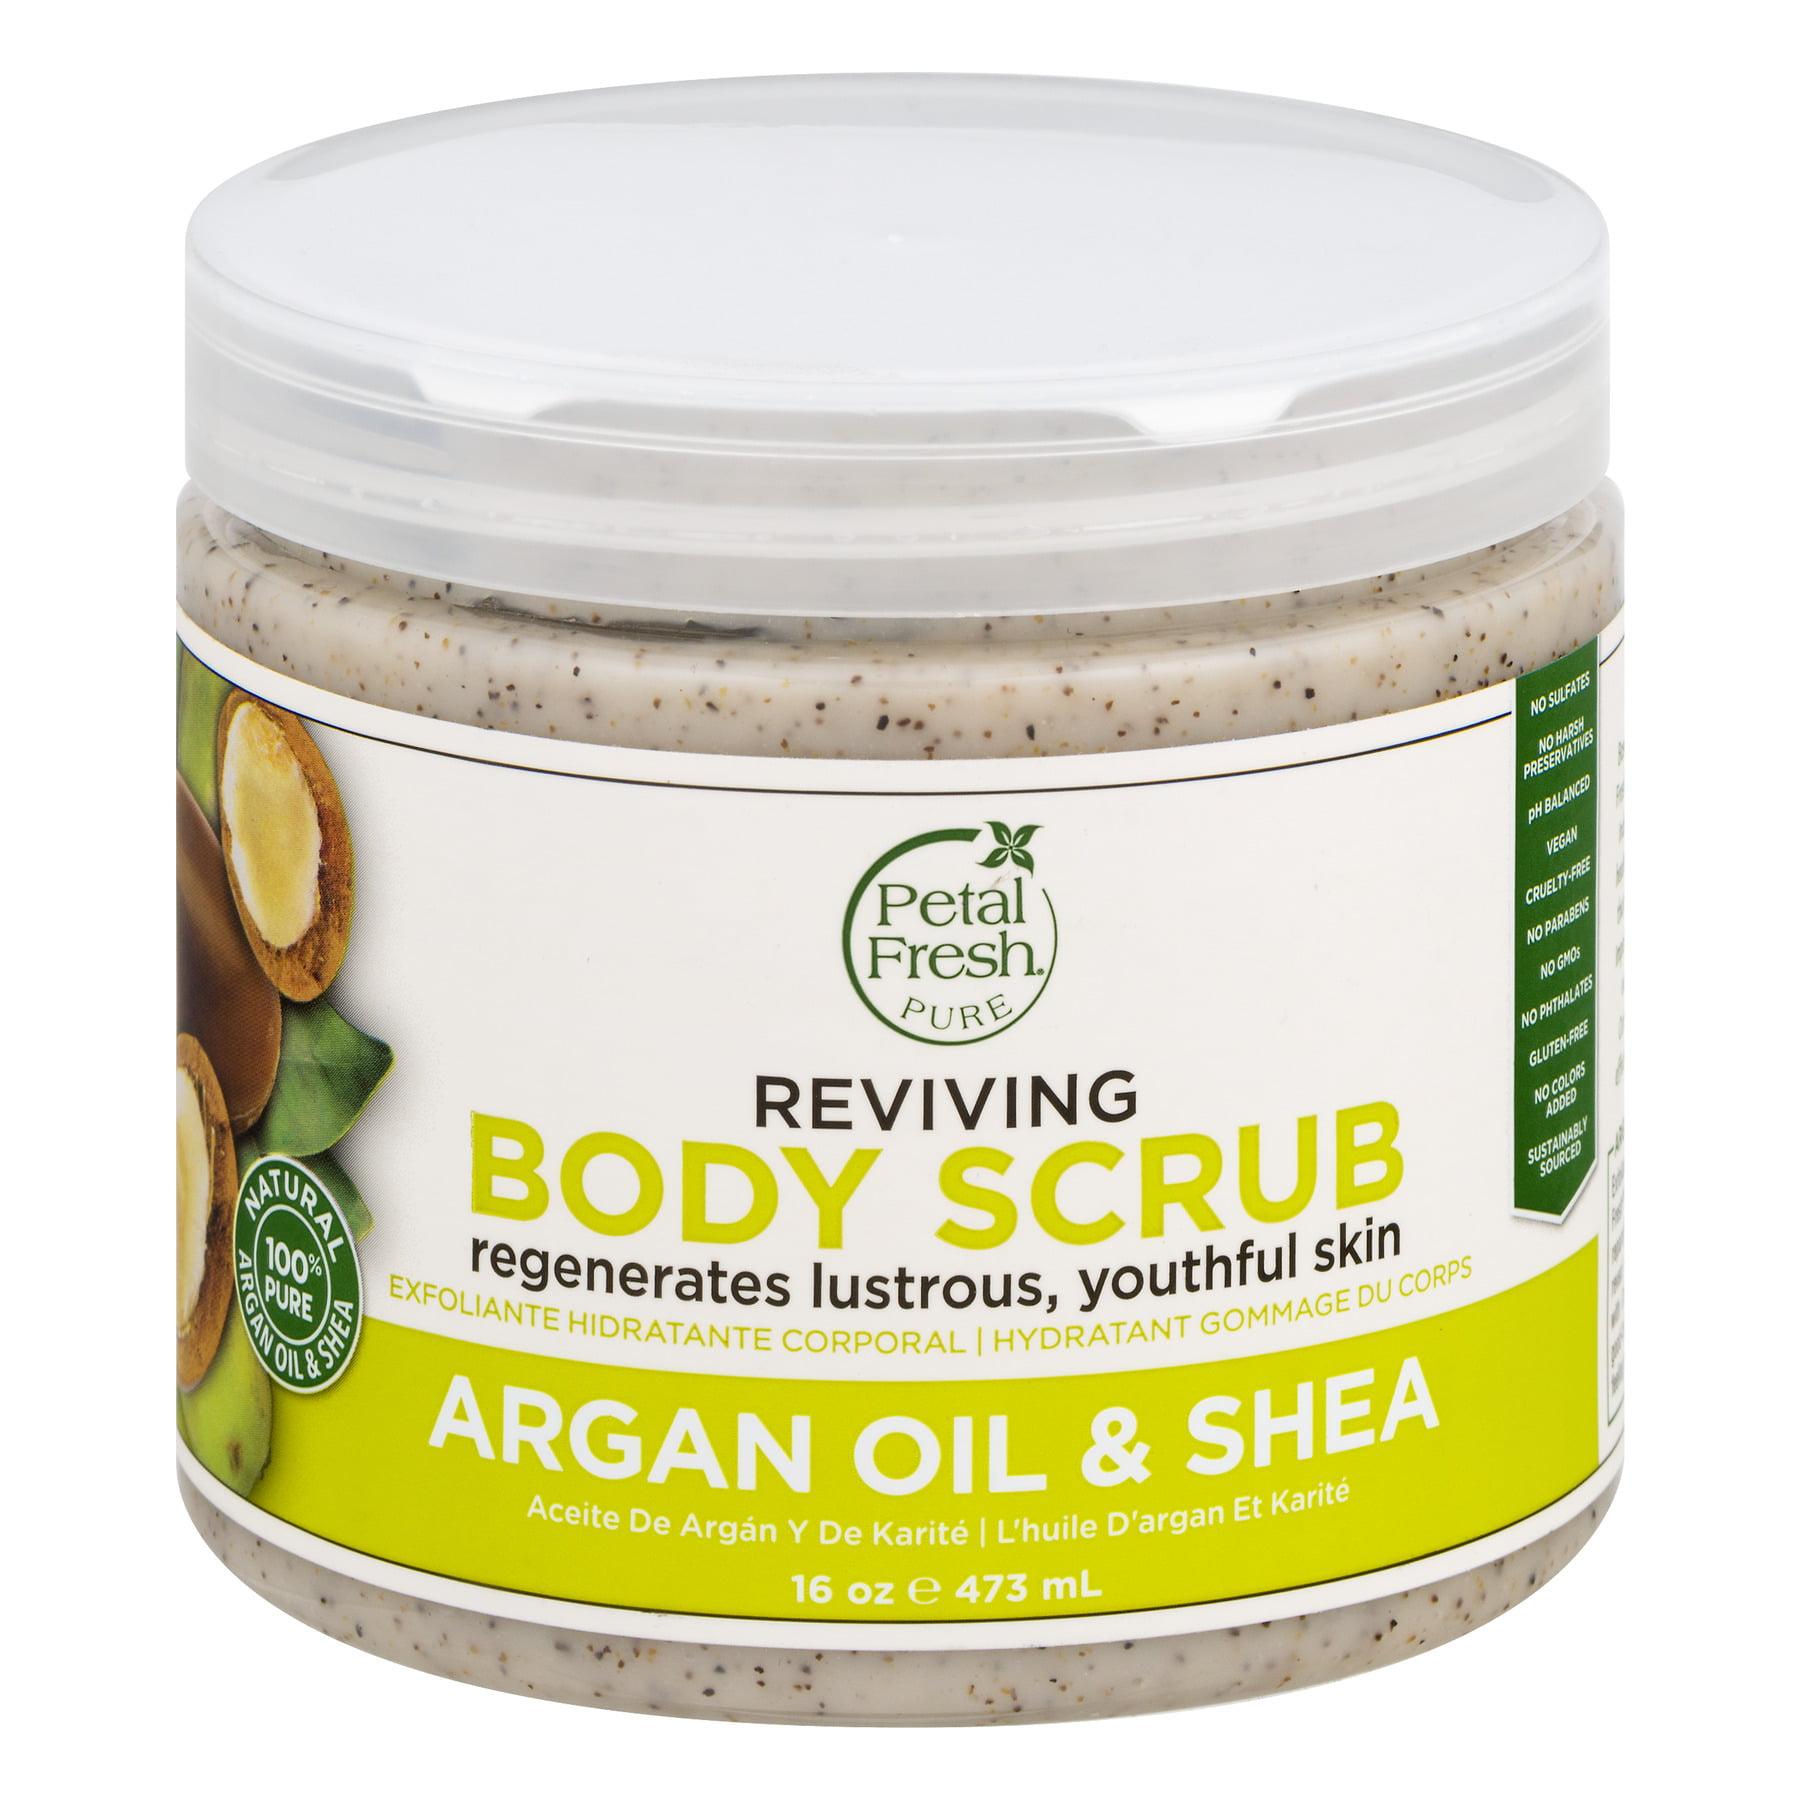 Petal Fresh Pure Argan Oil & Shea Reviving Body Scrub, 16 oz